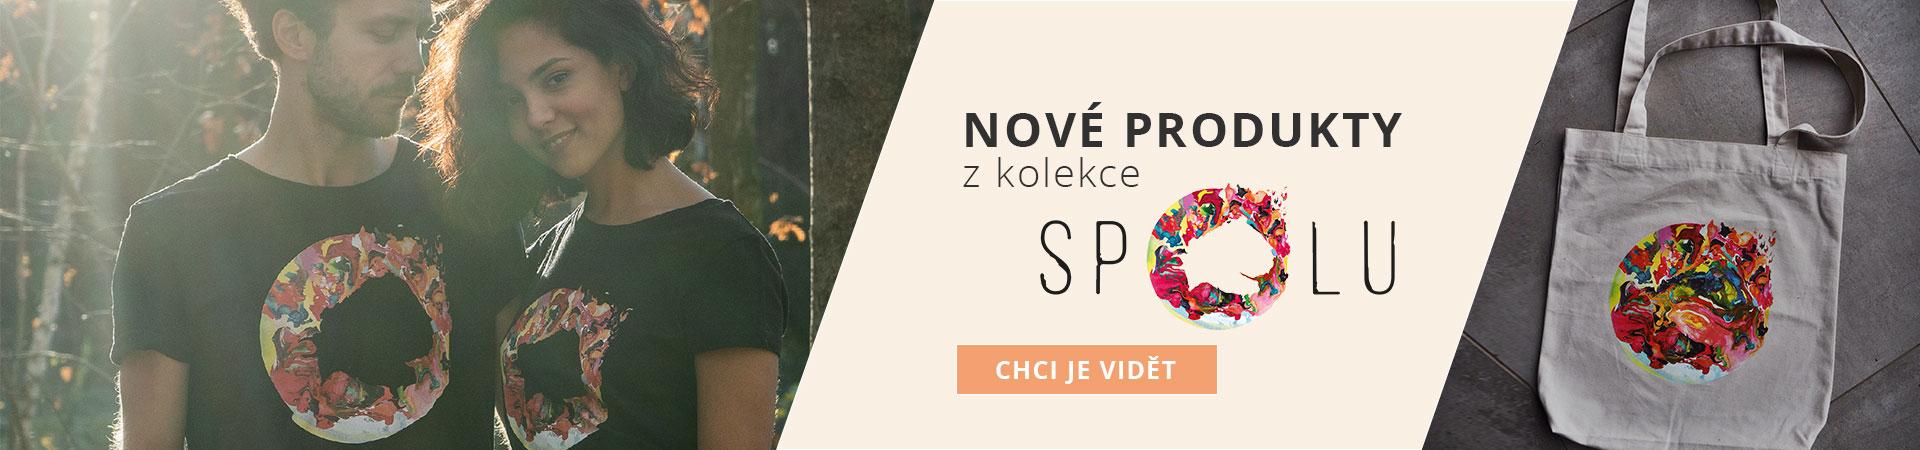 Kolekce SPOLU Tomáš Klus